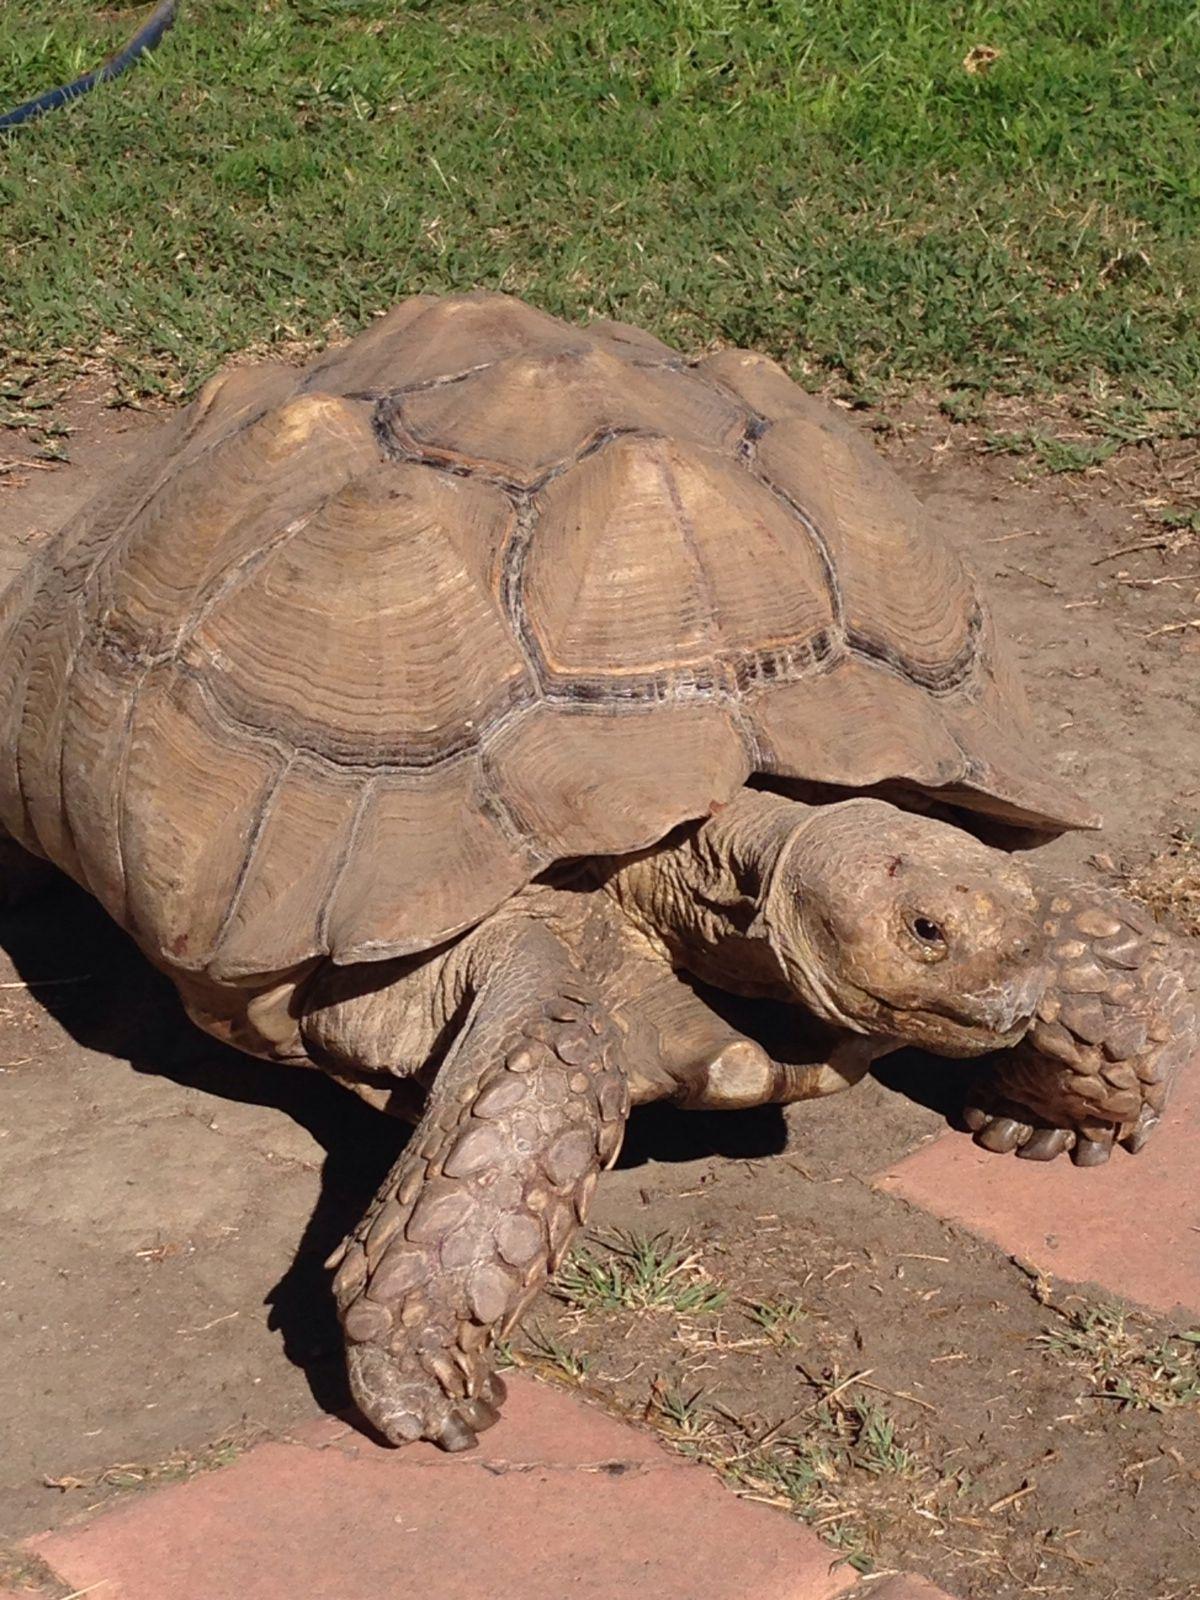 Kingsley the Sulcata tortoise